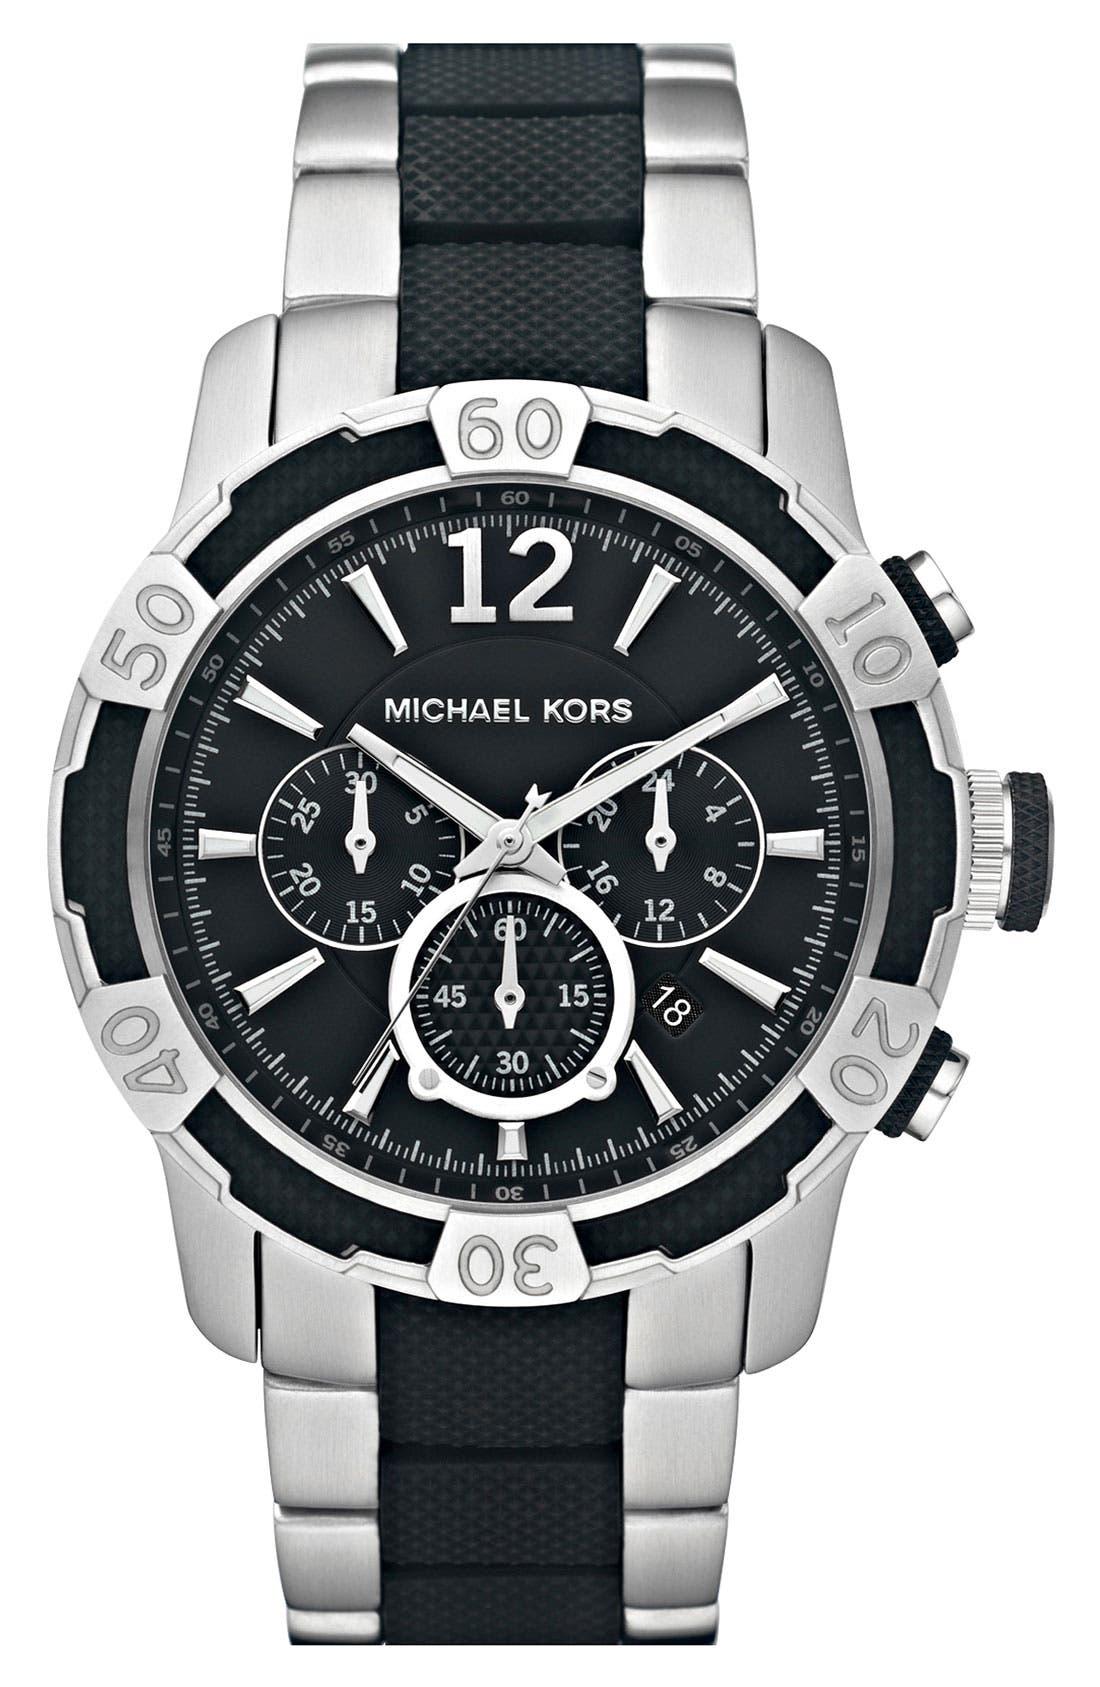 Main Image - Michael Kors 'Diver' Chronograph Watch